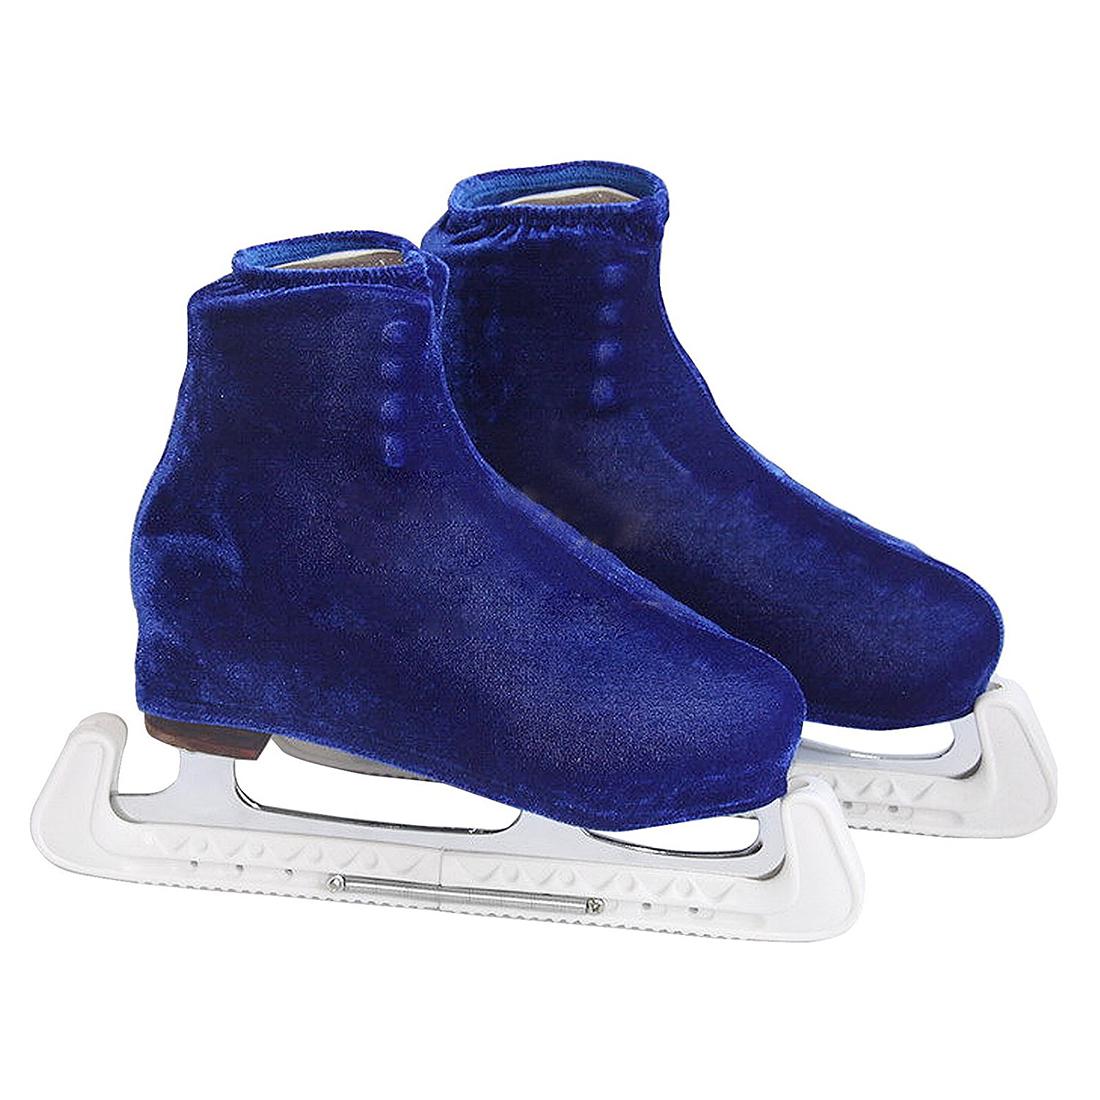 1-Pair-of-Figure-Skate-Shoe-Cover-Ice-Knife-Blade-Protector-Figure-skate-sh-M5E9 thumbnail 12